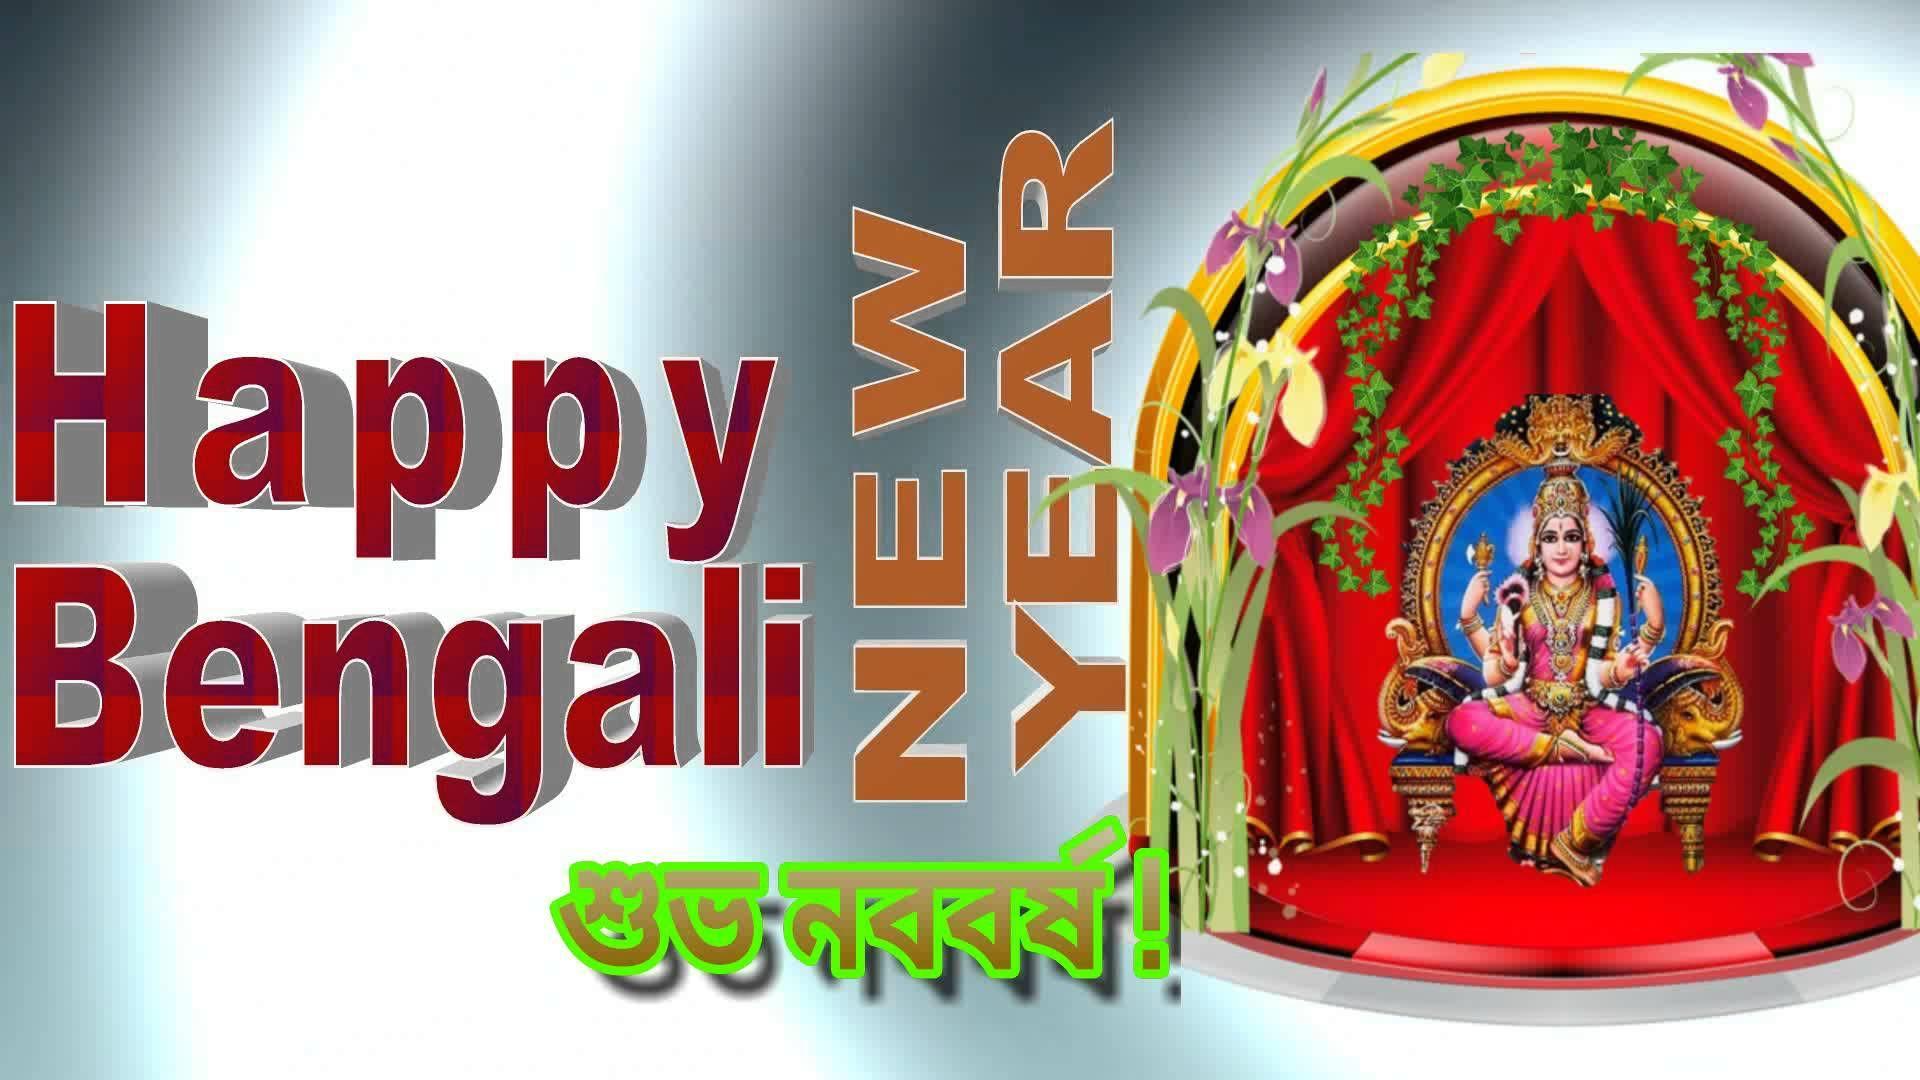 Happy Pohela Boishakh 2016 Poila Baisakh Greetings Poila Baisakh Wishe Happy Bengali New Year Greetings Morning Greeting